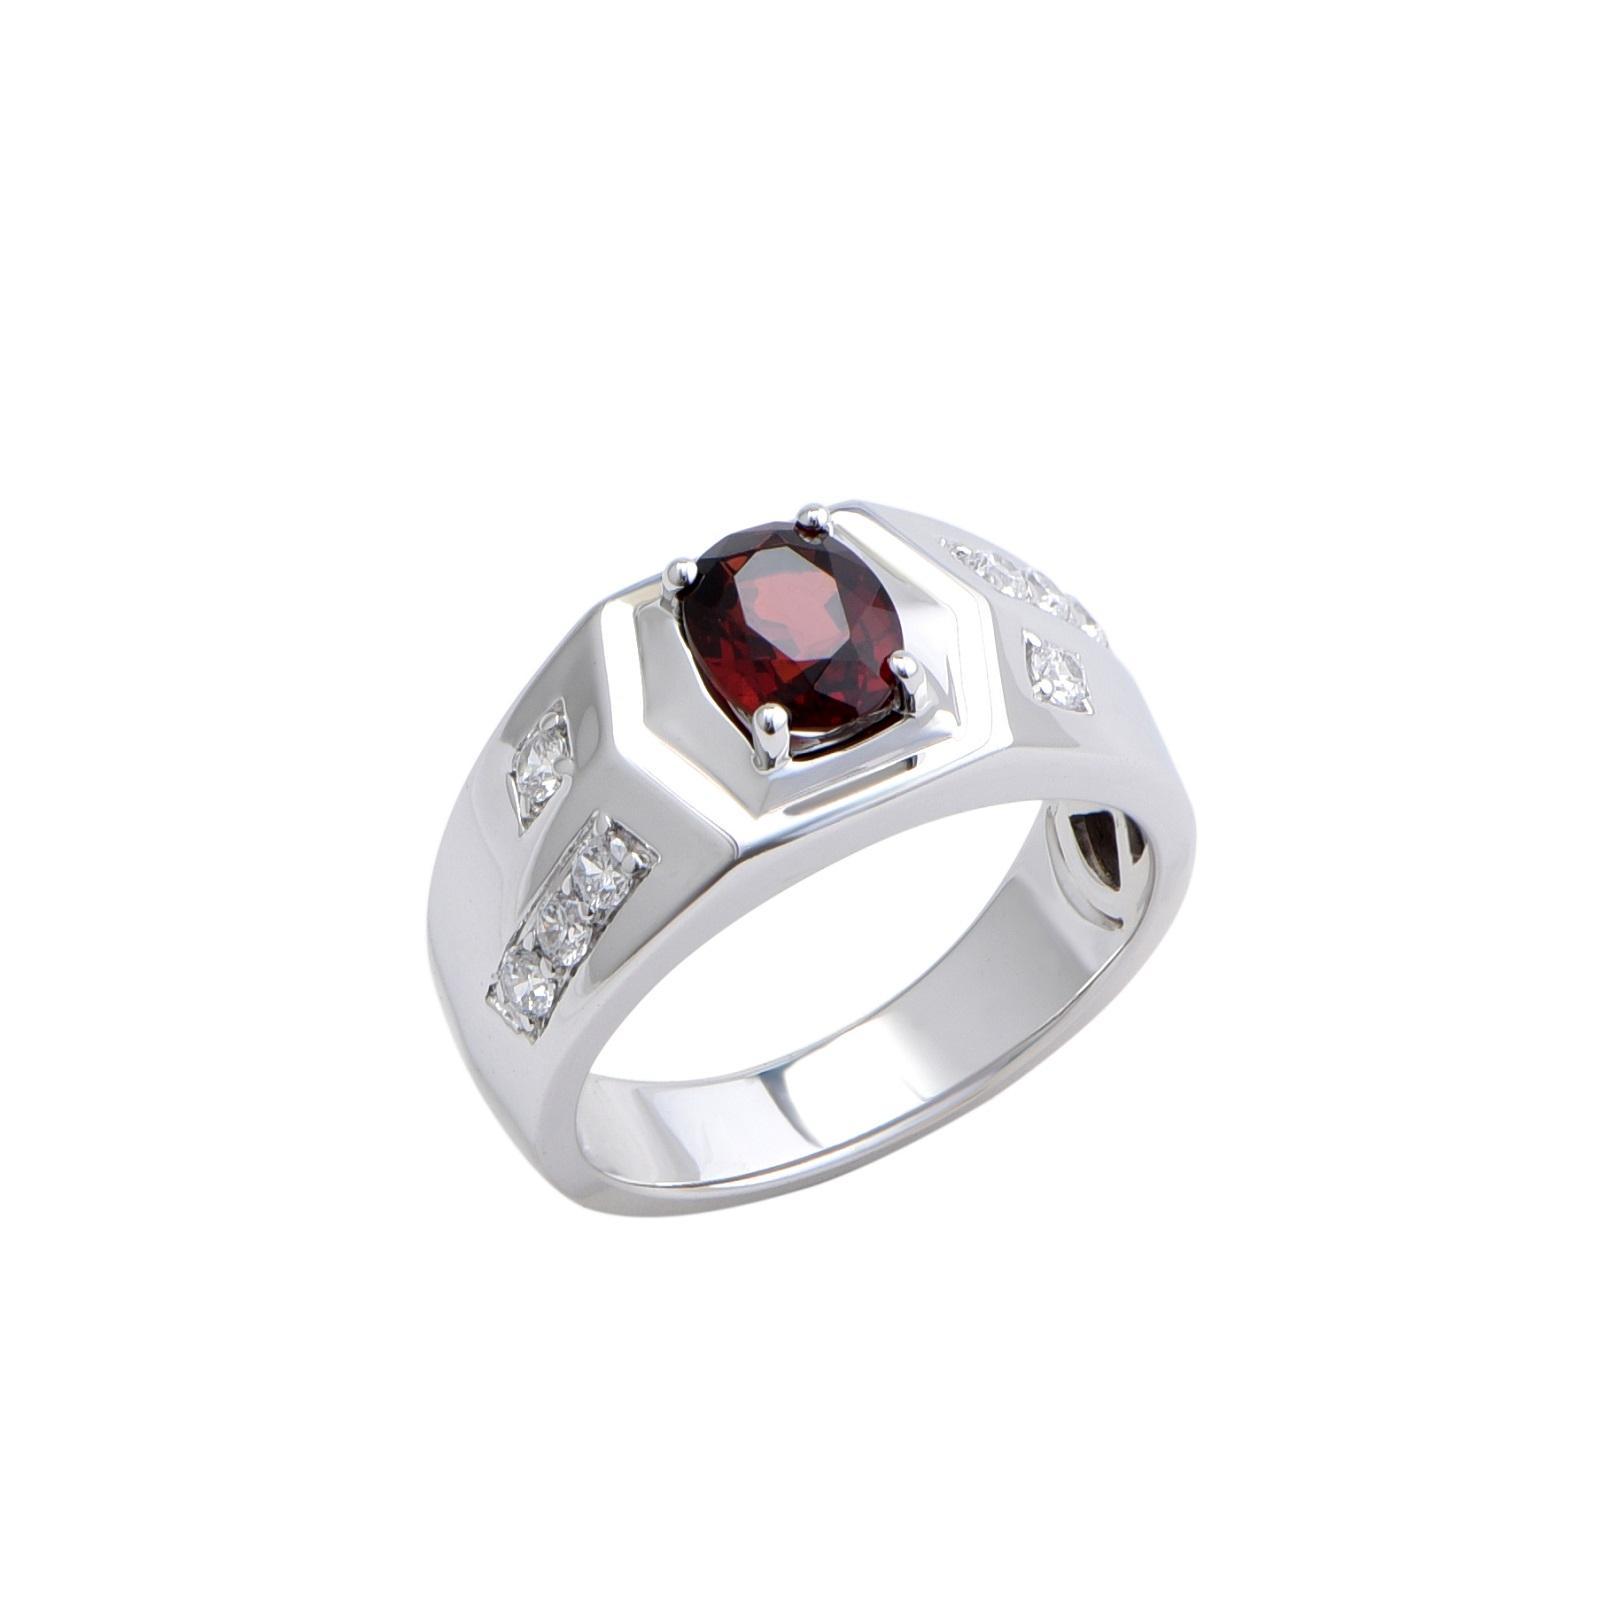 Nhẫn nam đá Garnet 21NN046